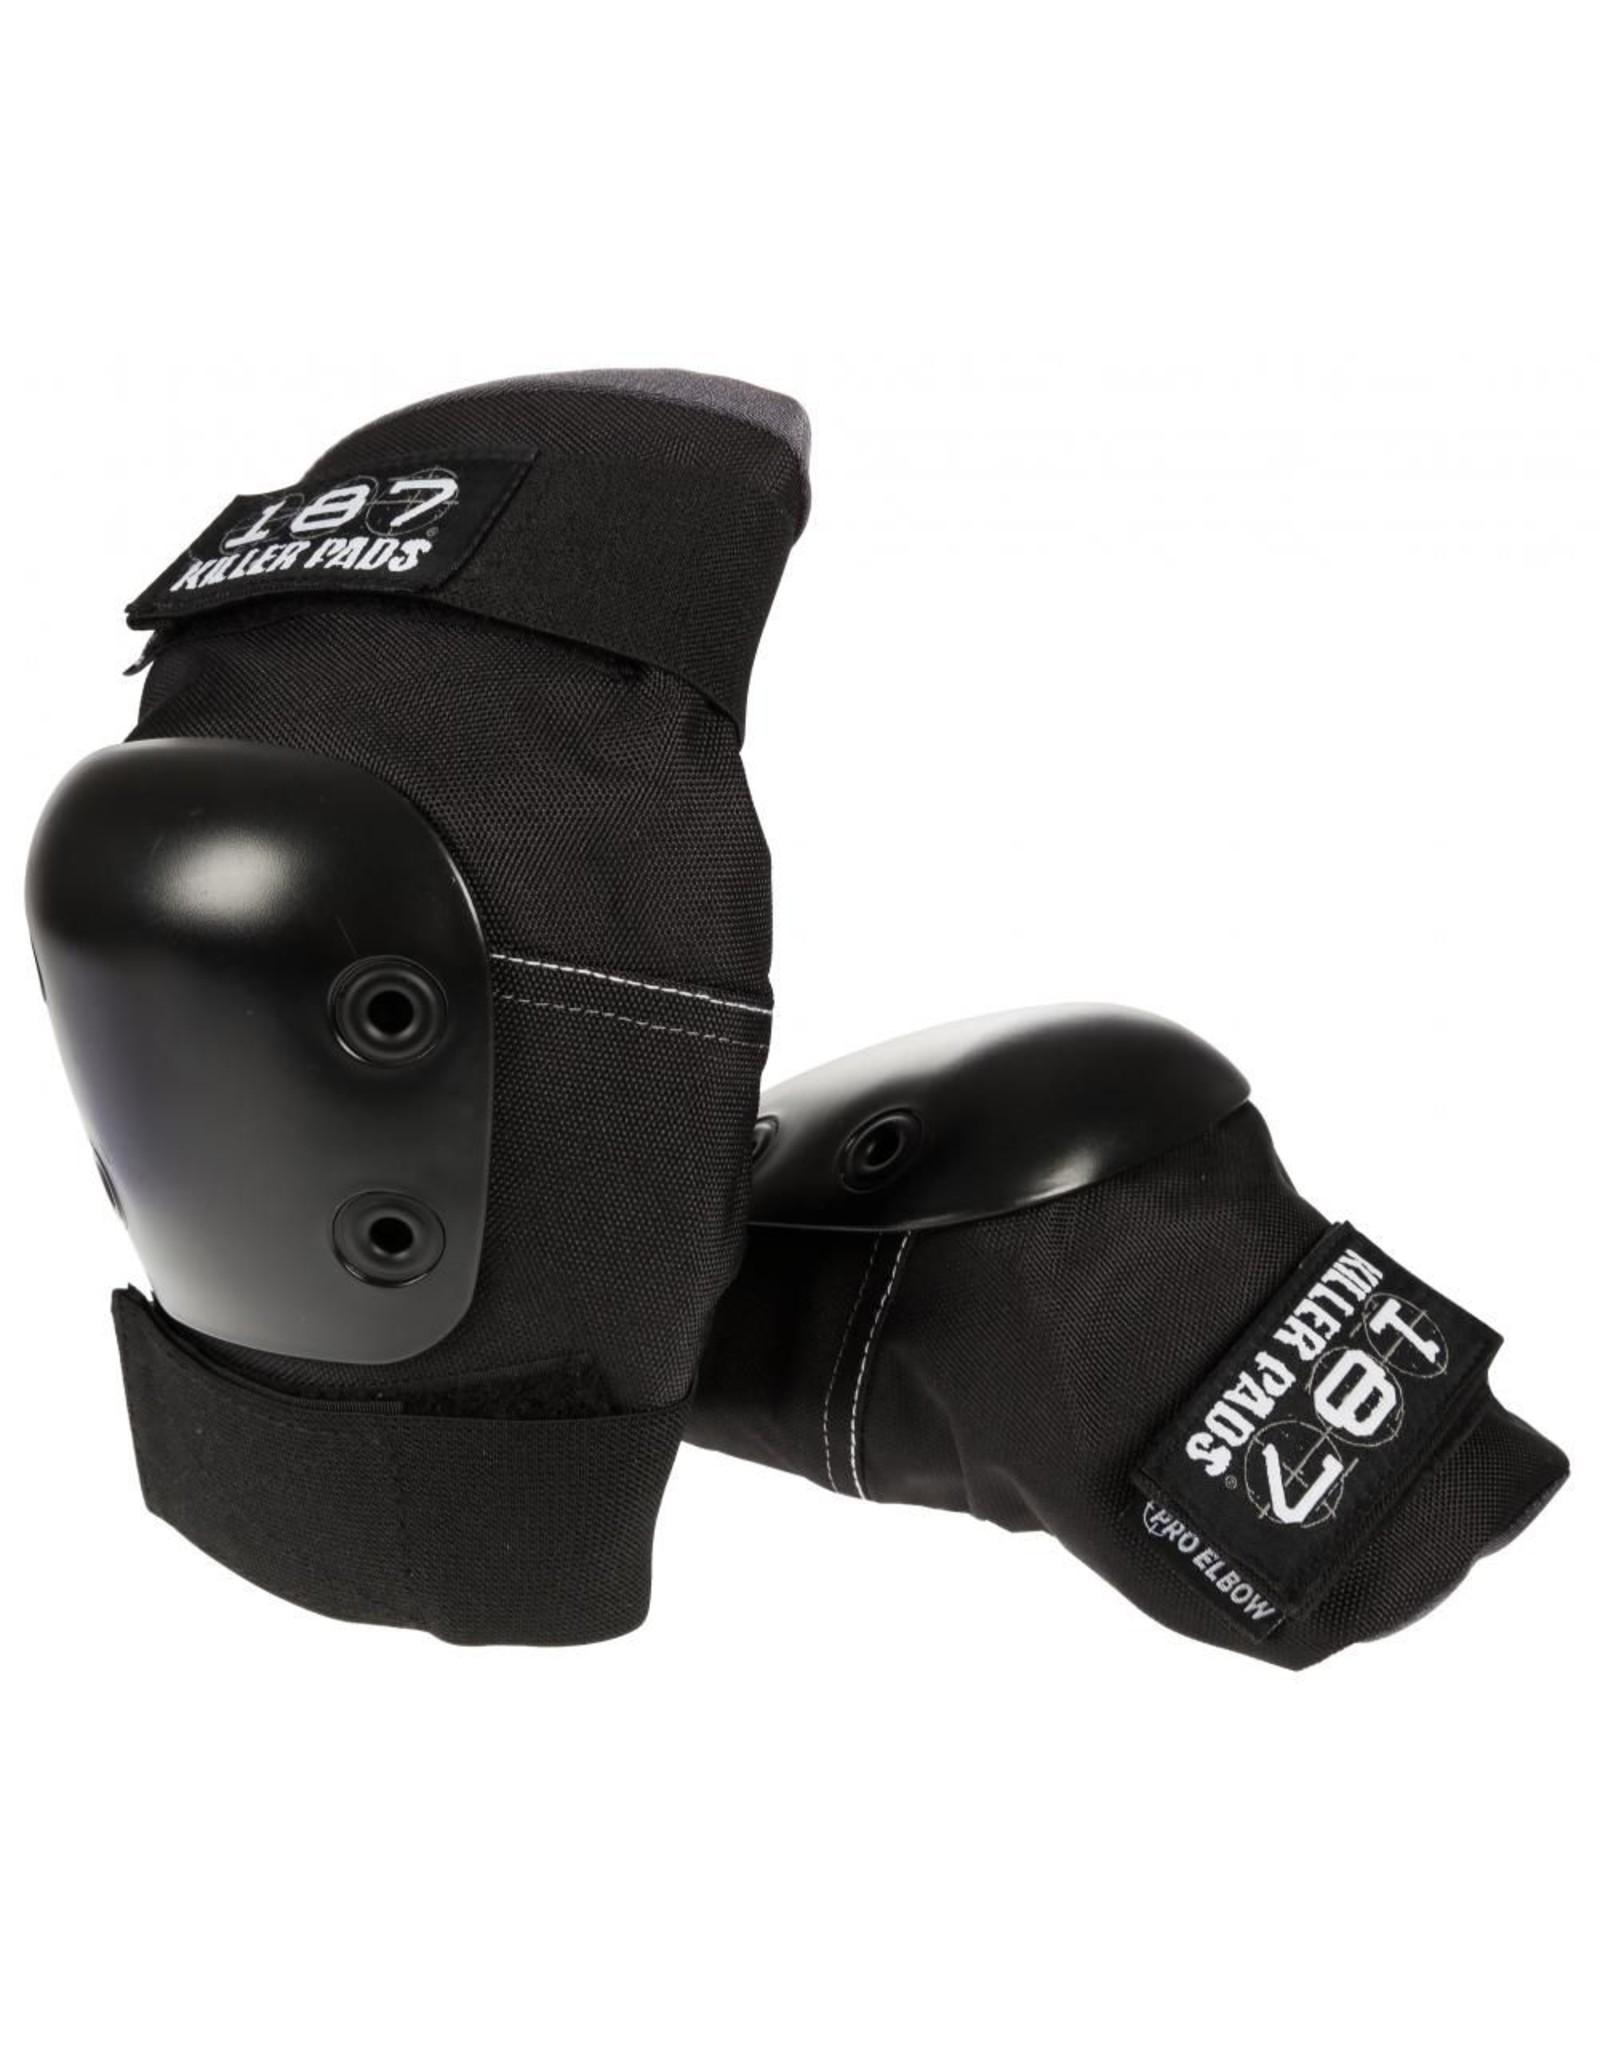 187 187 - Killer Pads Pro Elbow - Black - S